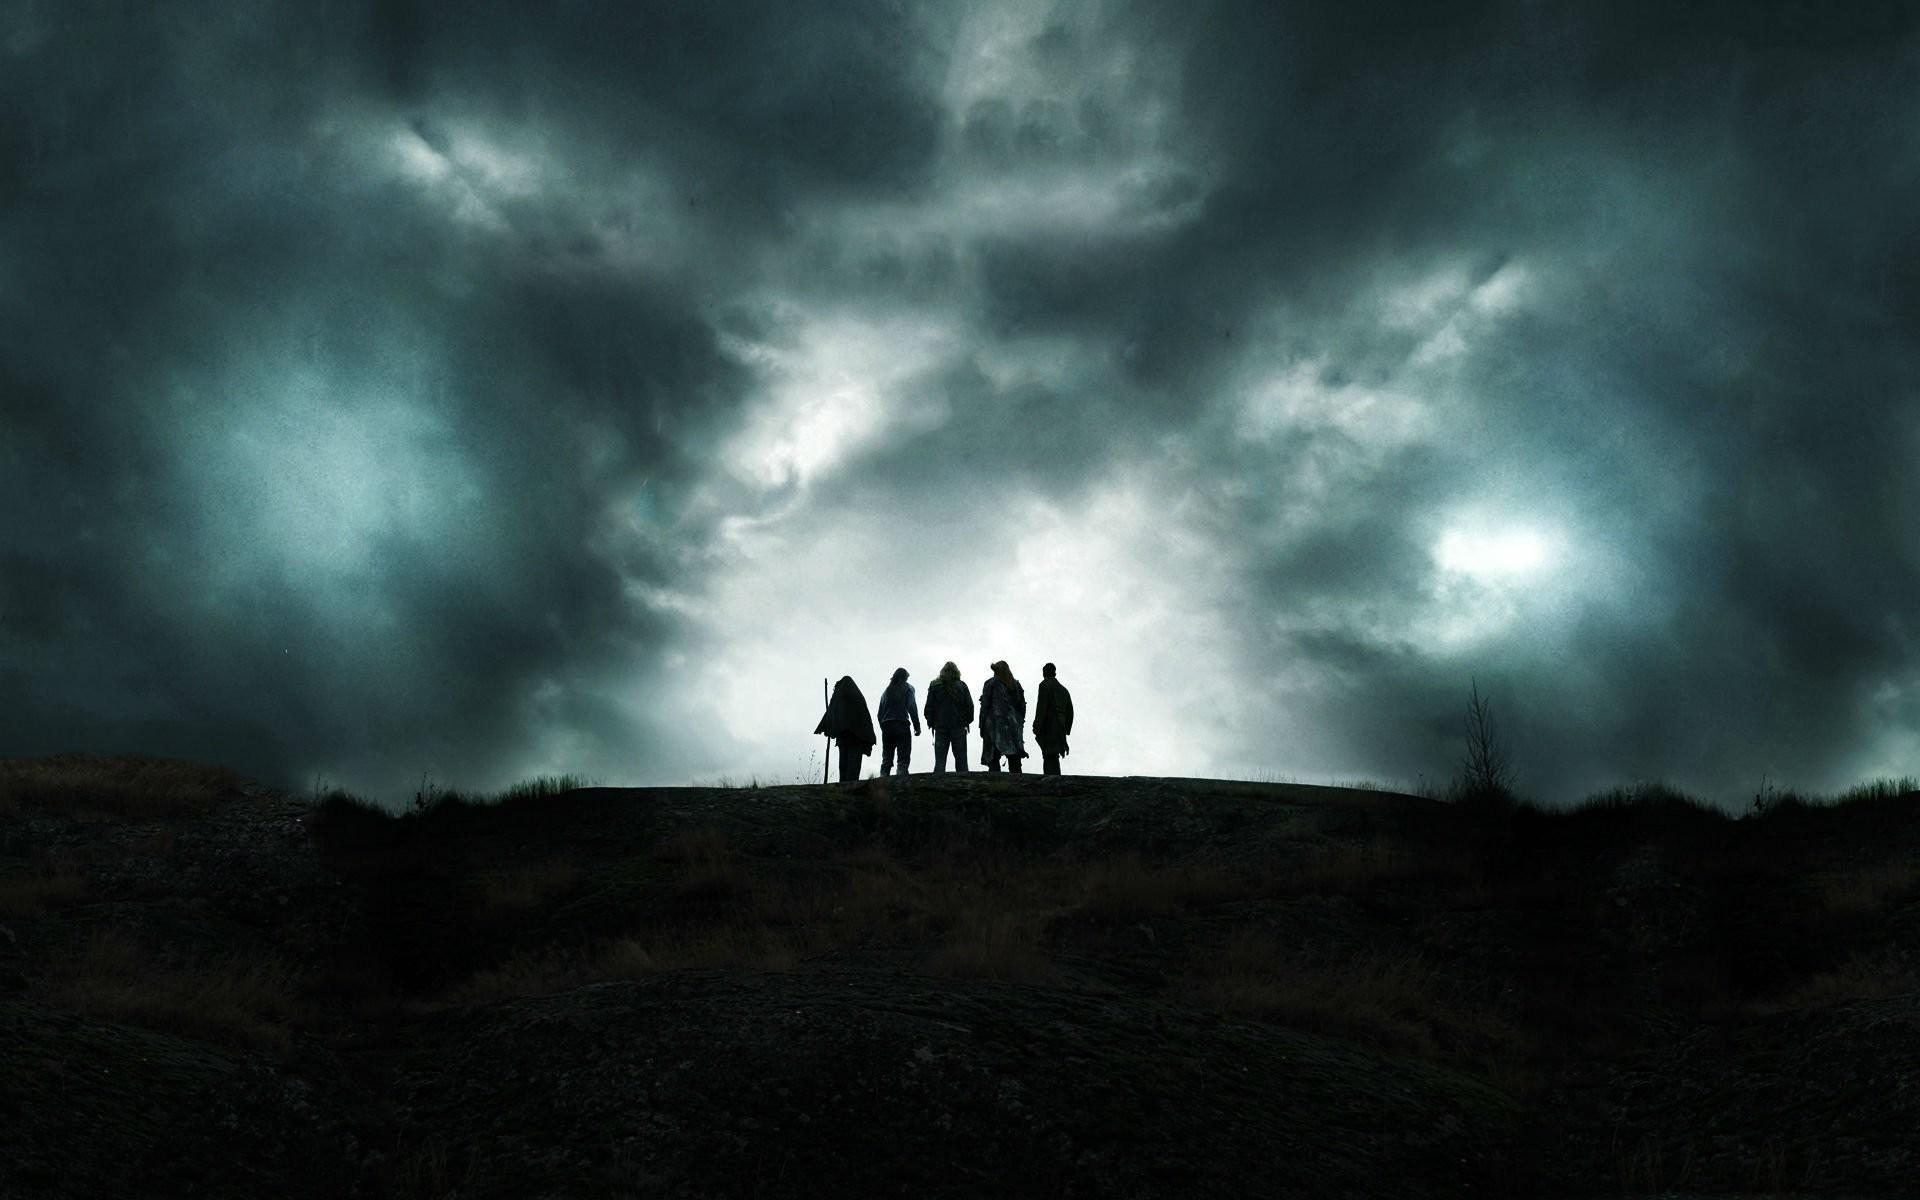 moonsorrow viking metal pagan metal folk metal black metal